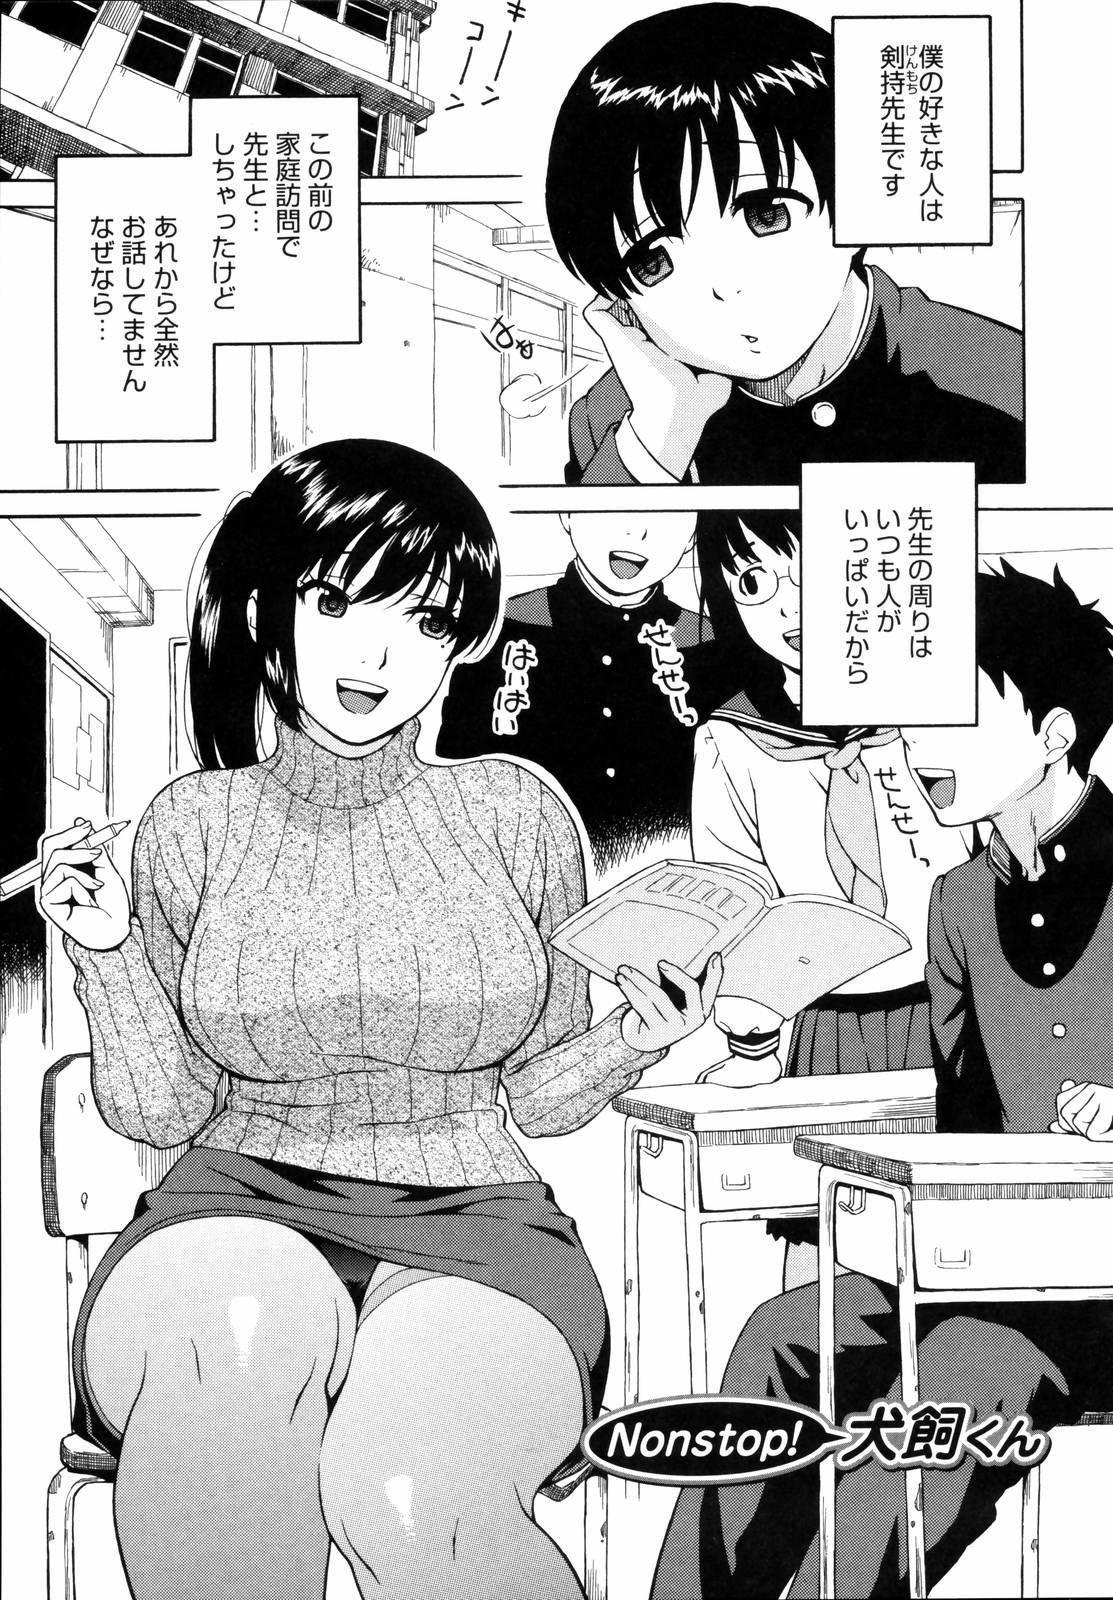 Shishunki wa Hatsujouki - Adolescence is a sexual excitement period. 128